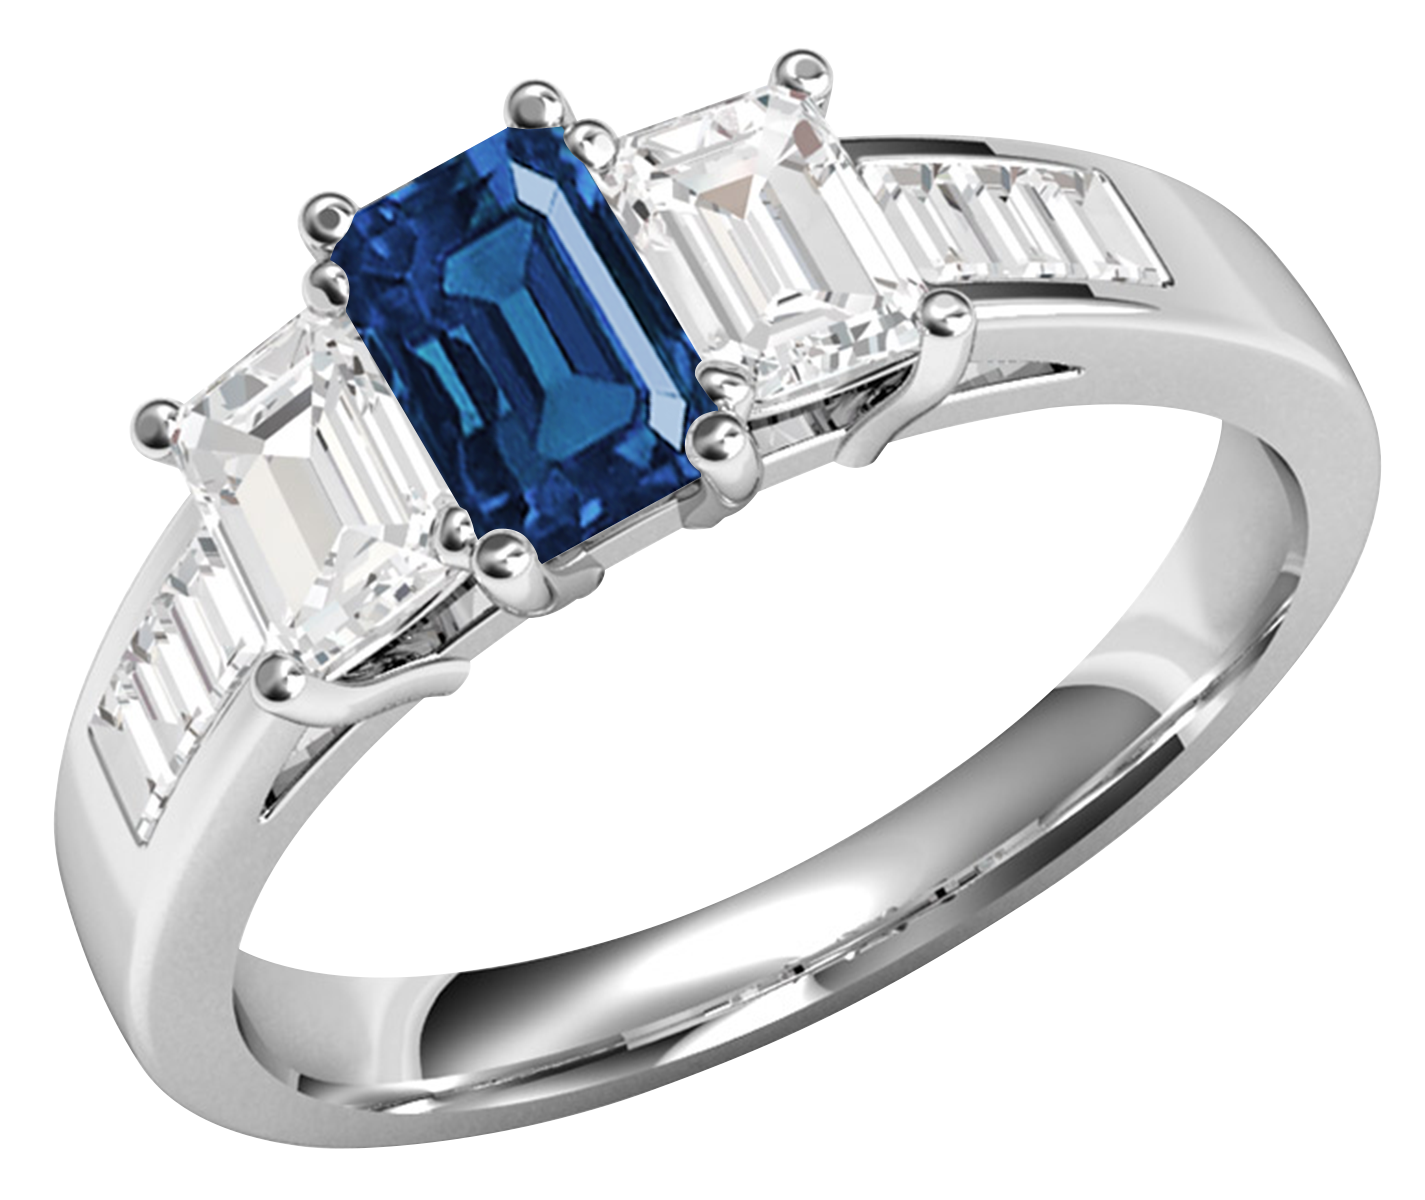 RDS603W-Inel cu Safir si Diamante Dama Aur Alb 18kt cu un Safir si 2Diamante in Forma Smarald in Setare Gheare si Diamante in Forma Bagheta pe Lateral-img1